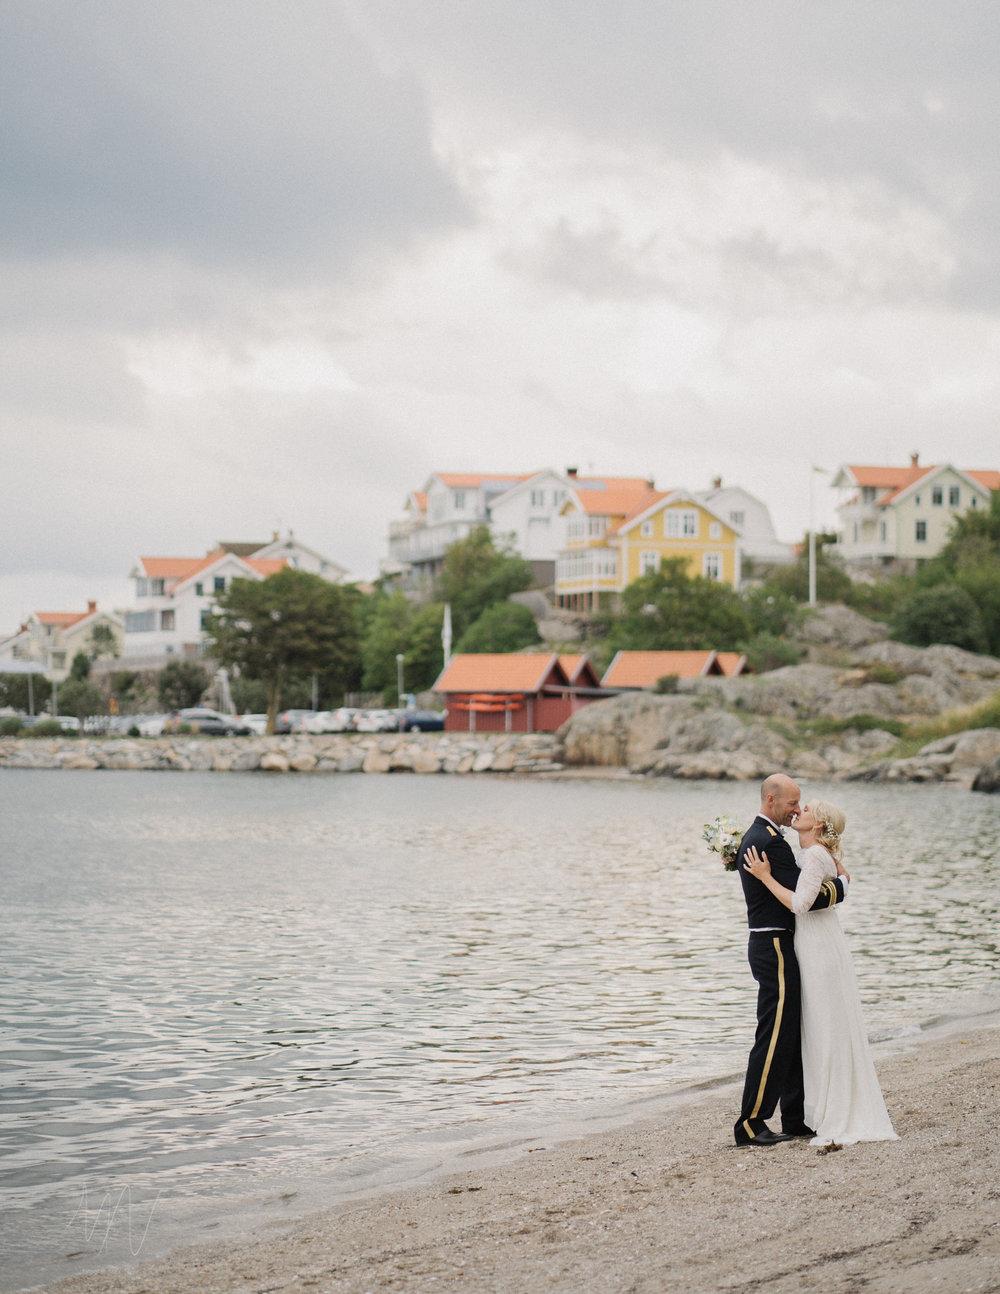 Bröllop-fotografmaxnorin.se-MariaMarcus-400.JPG